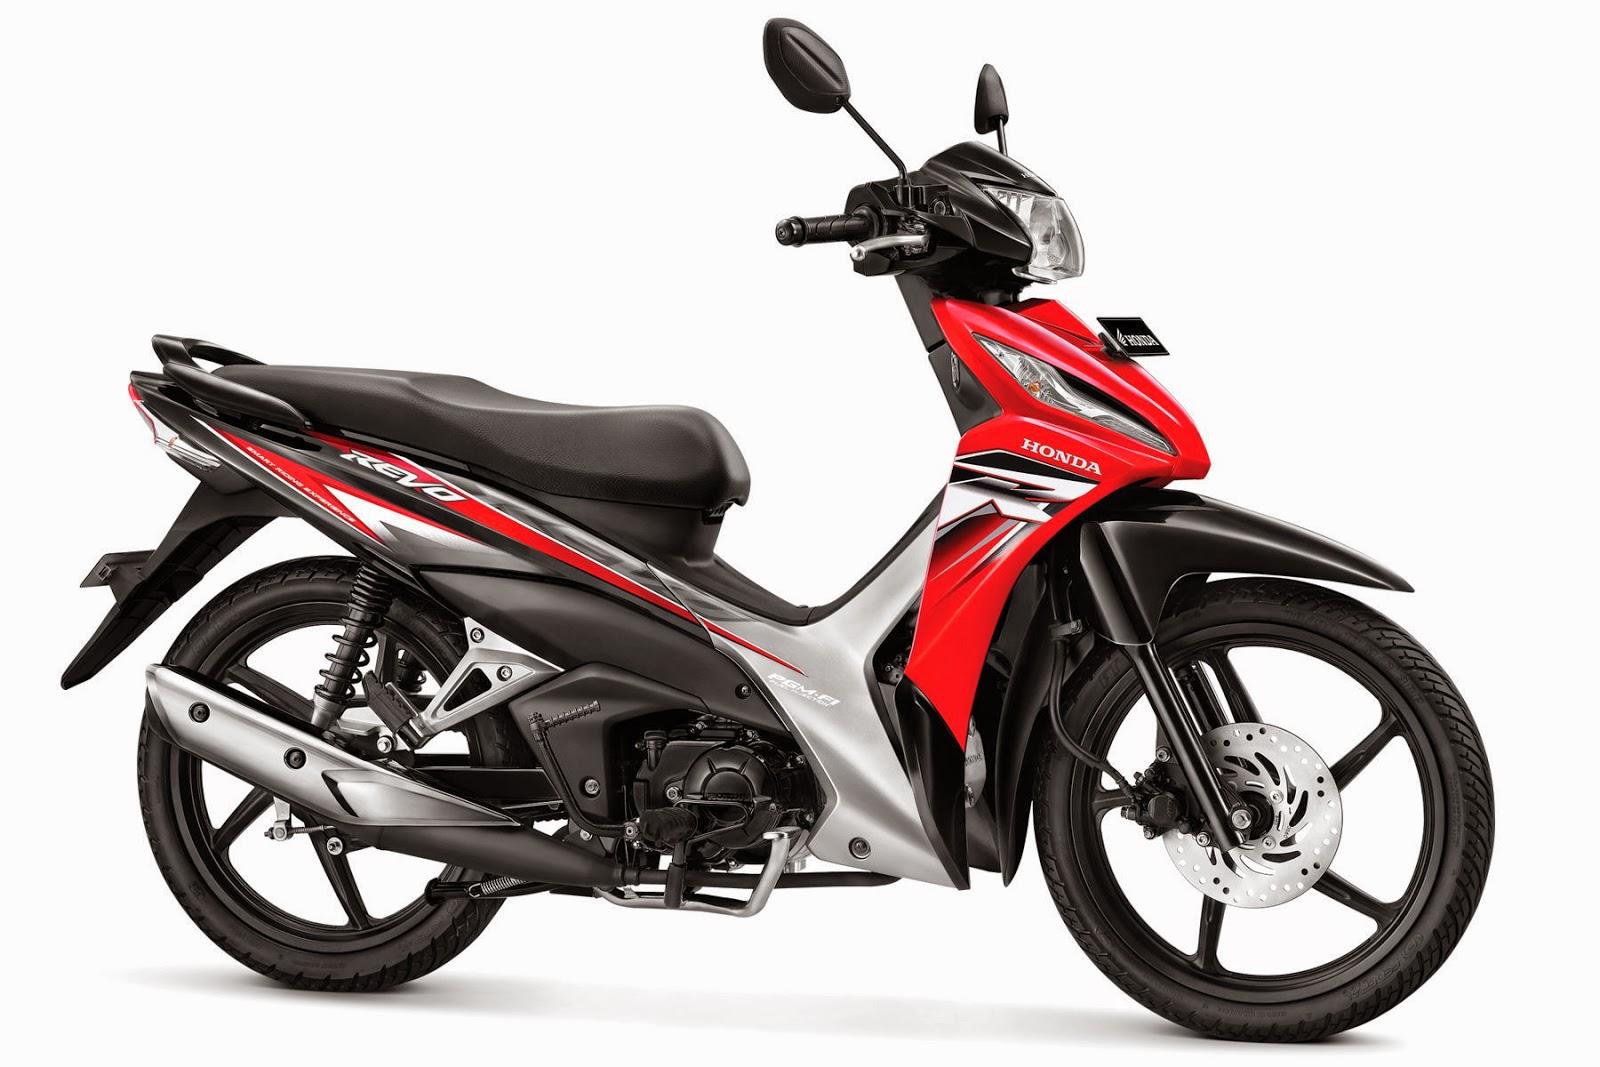 Modif Motor Honda New Revo FI